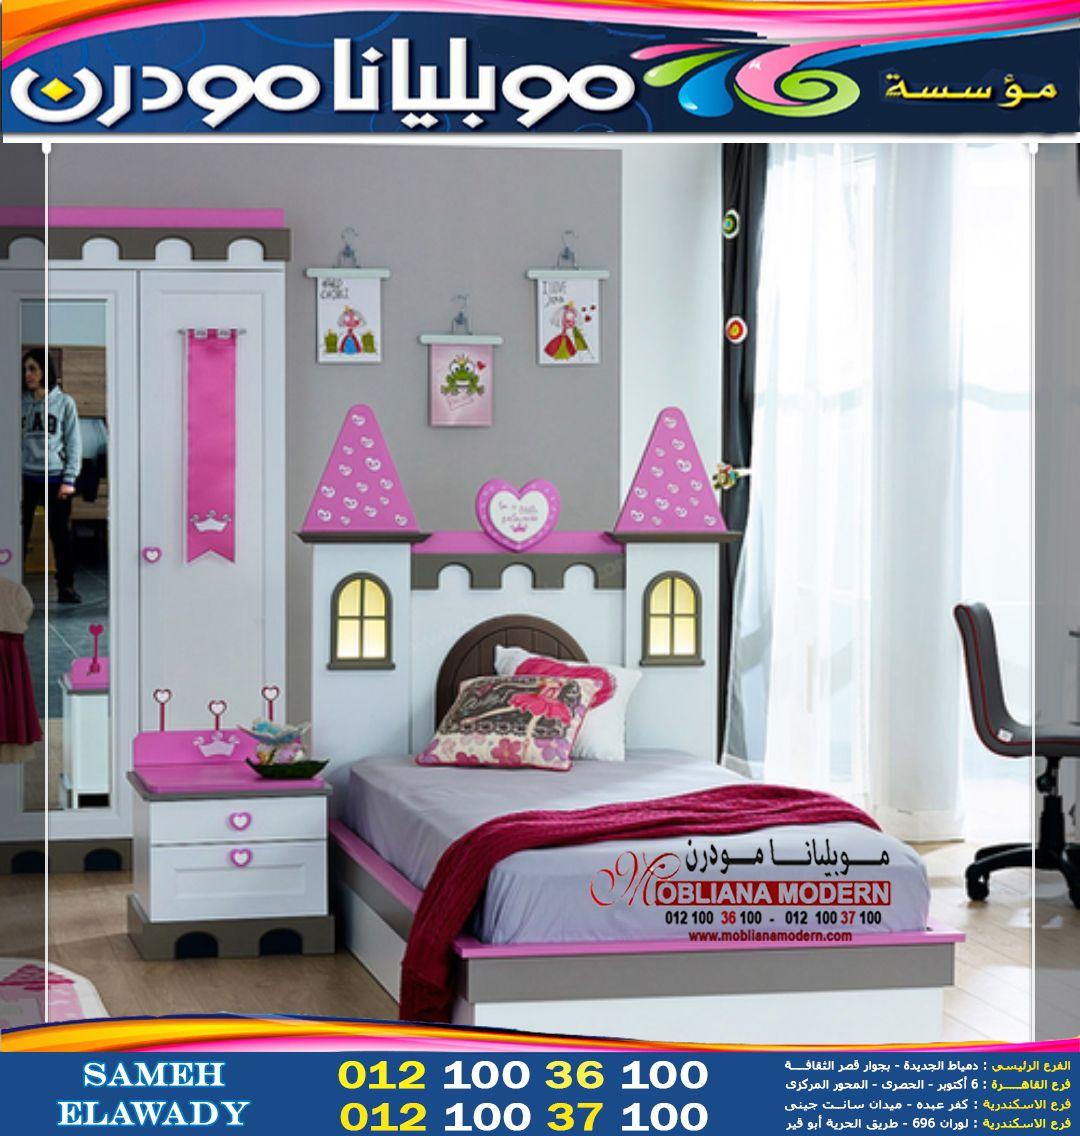 اثاث منزلي احدث تصميمات الاثاث المنزلي محلات اثاث لوران 2021 غرف اطفال مودرن In 2020 Room Toddler Bed Home